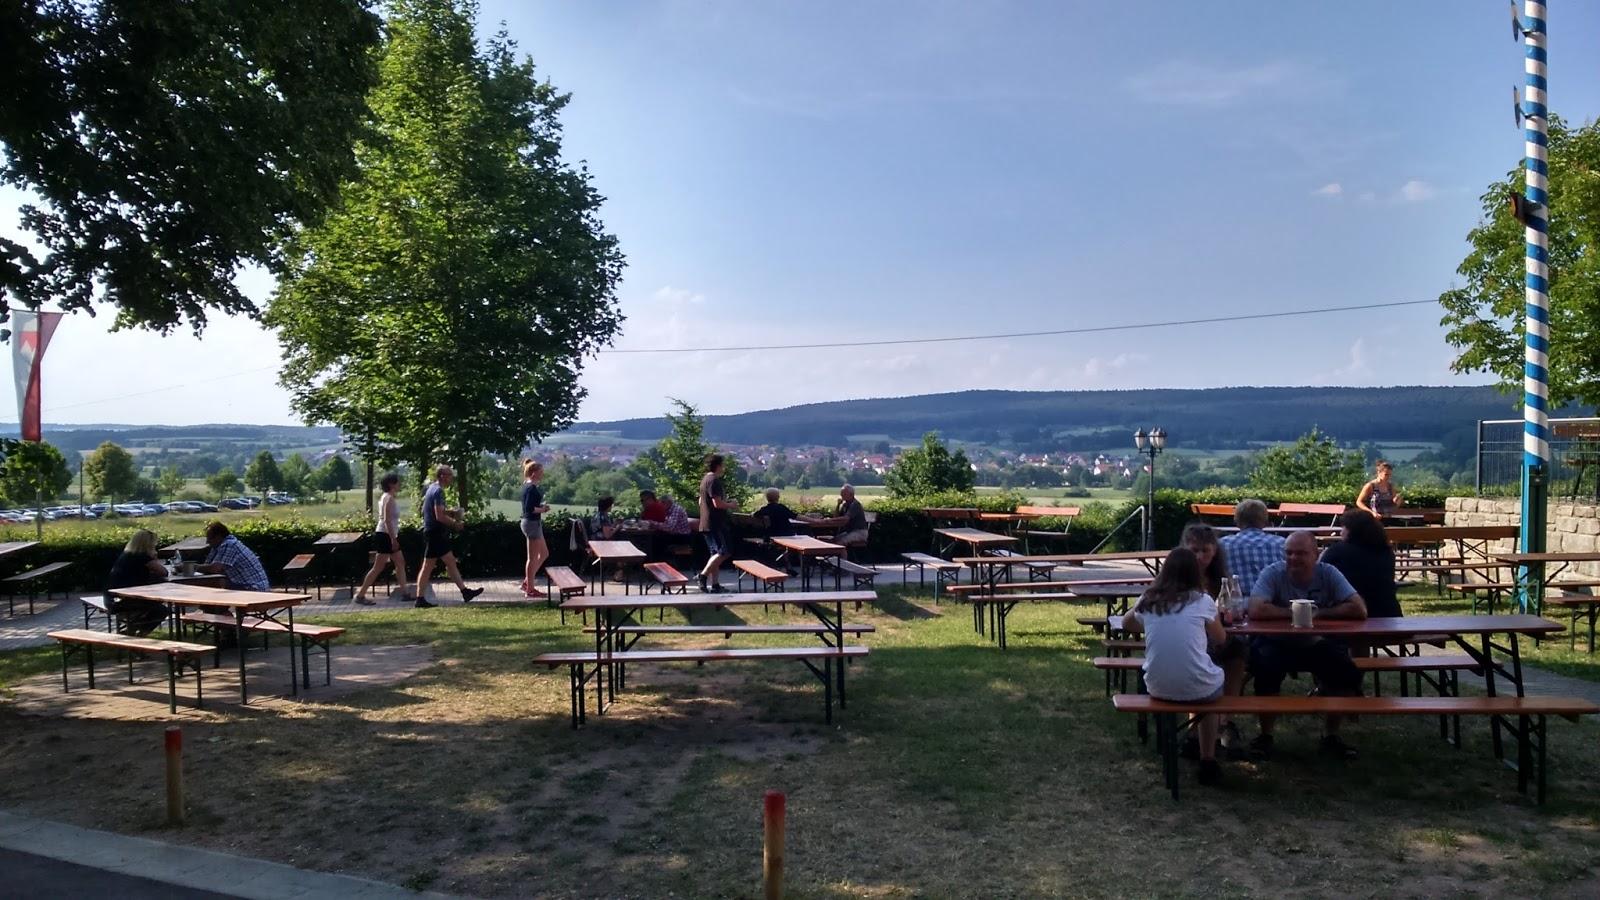 Paul S Beer Travel Blog Eine Frankische Tour A Franconian Tour